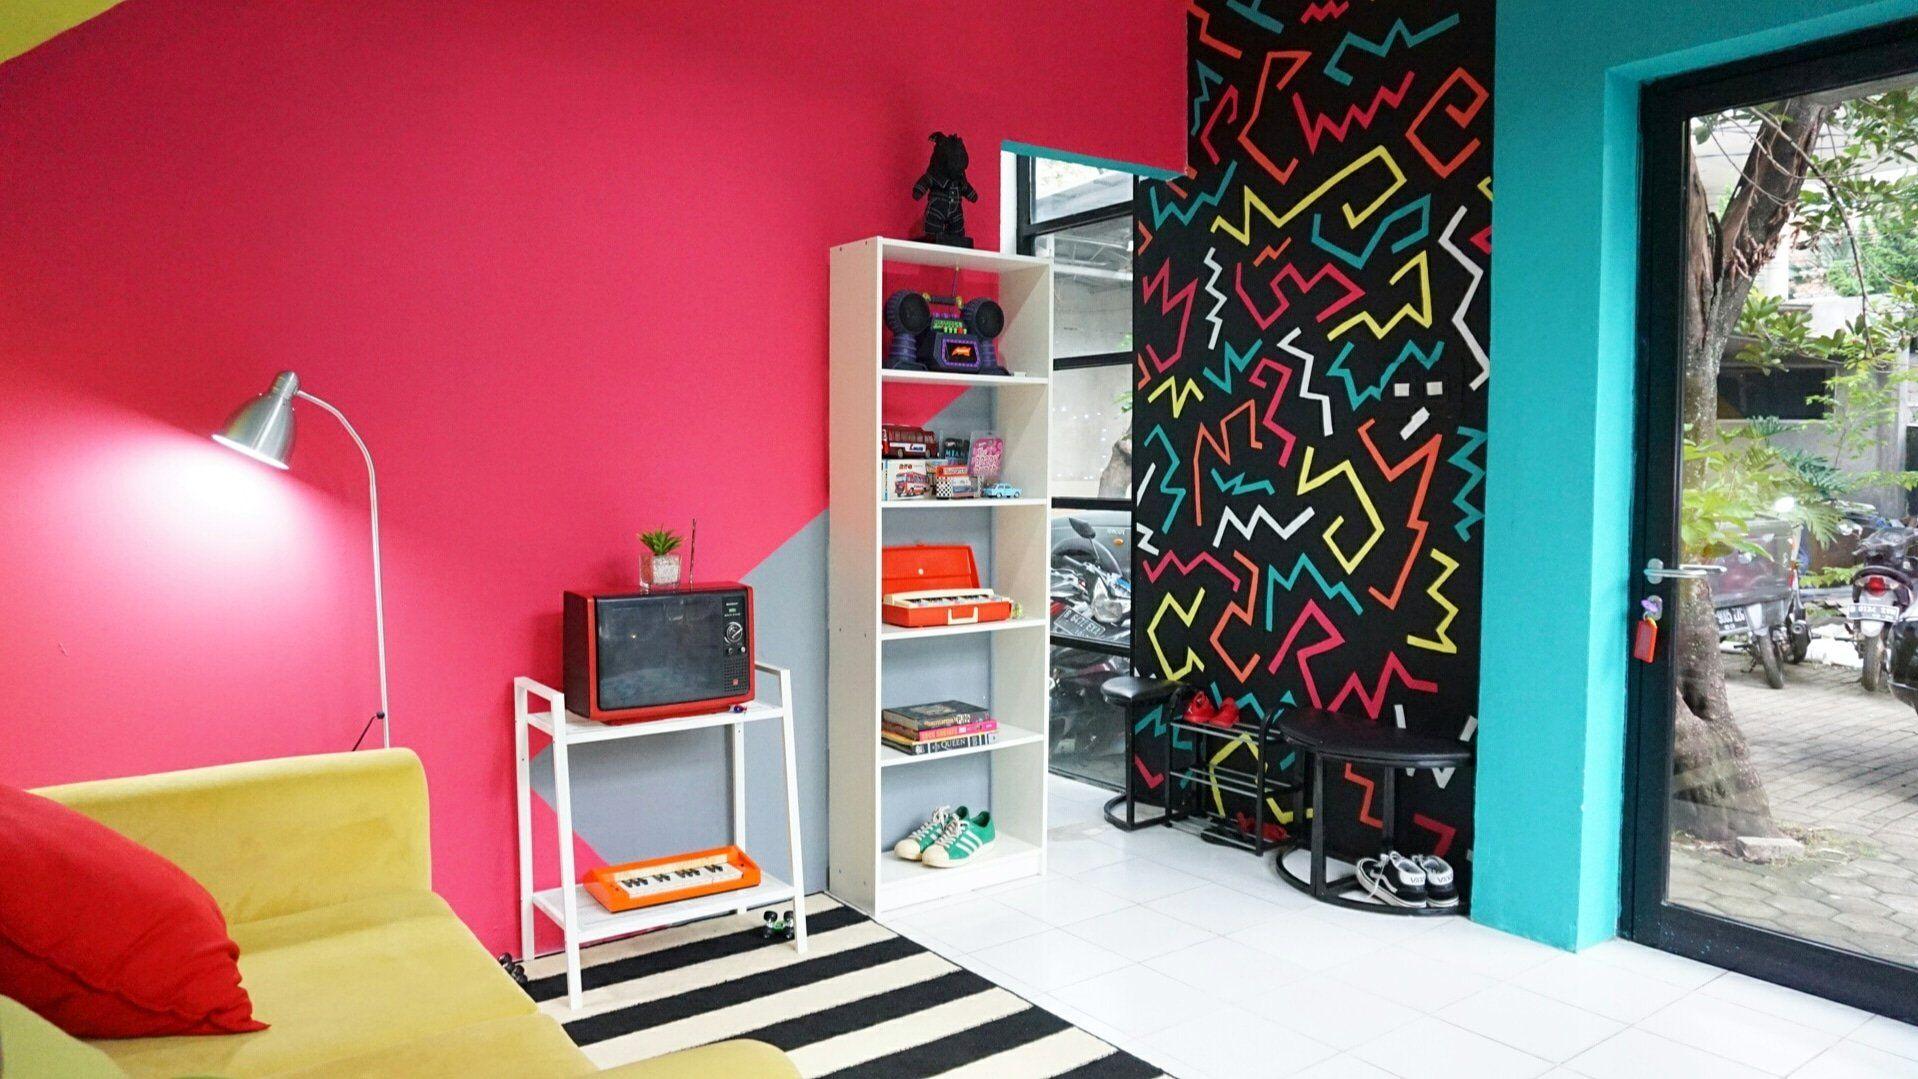 Pop Spot Studio Cilandak Jakarta Ig Popspot Studio Desain Interior Interior Desain